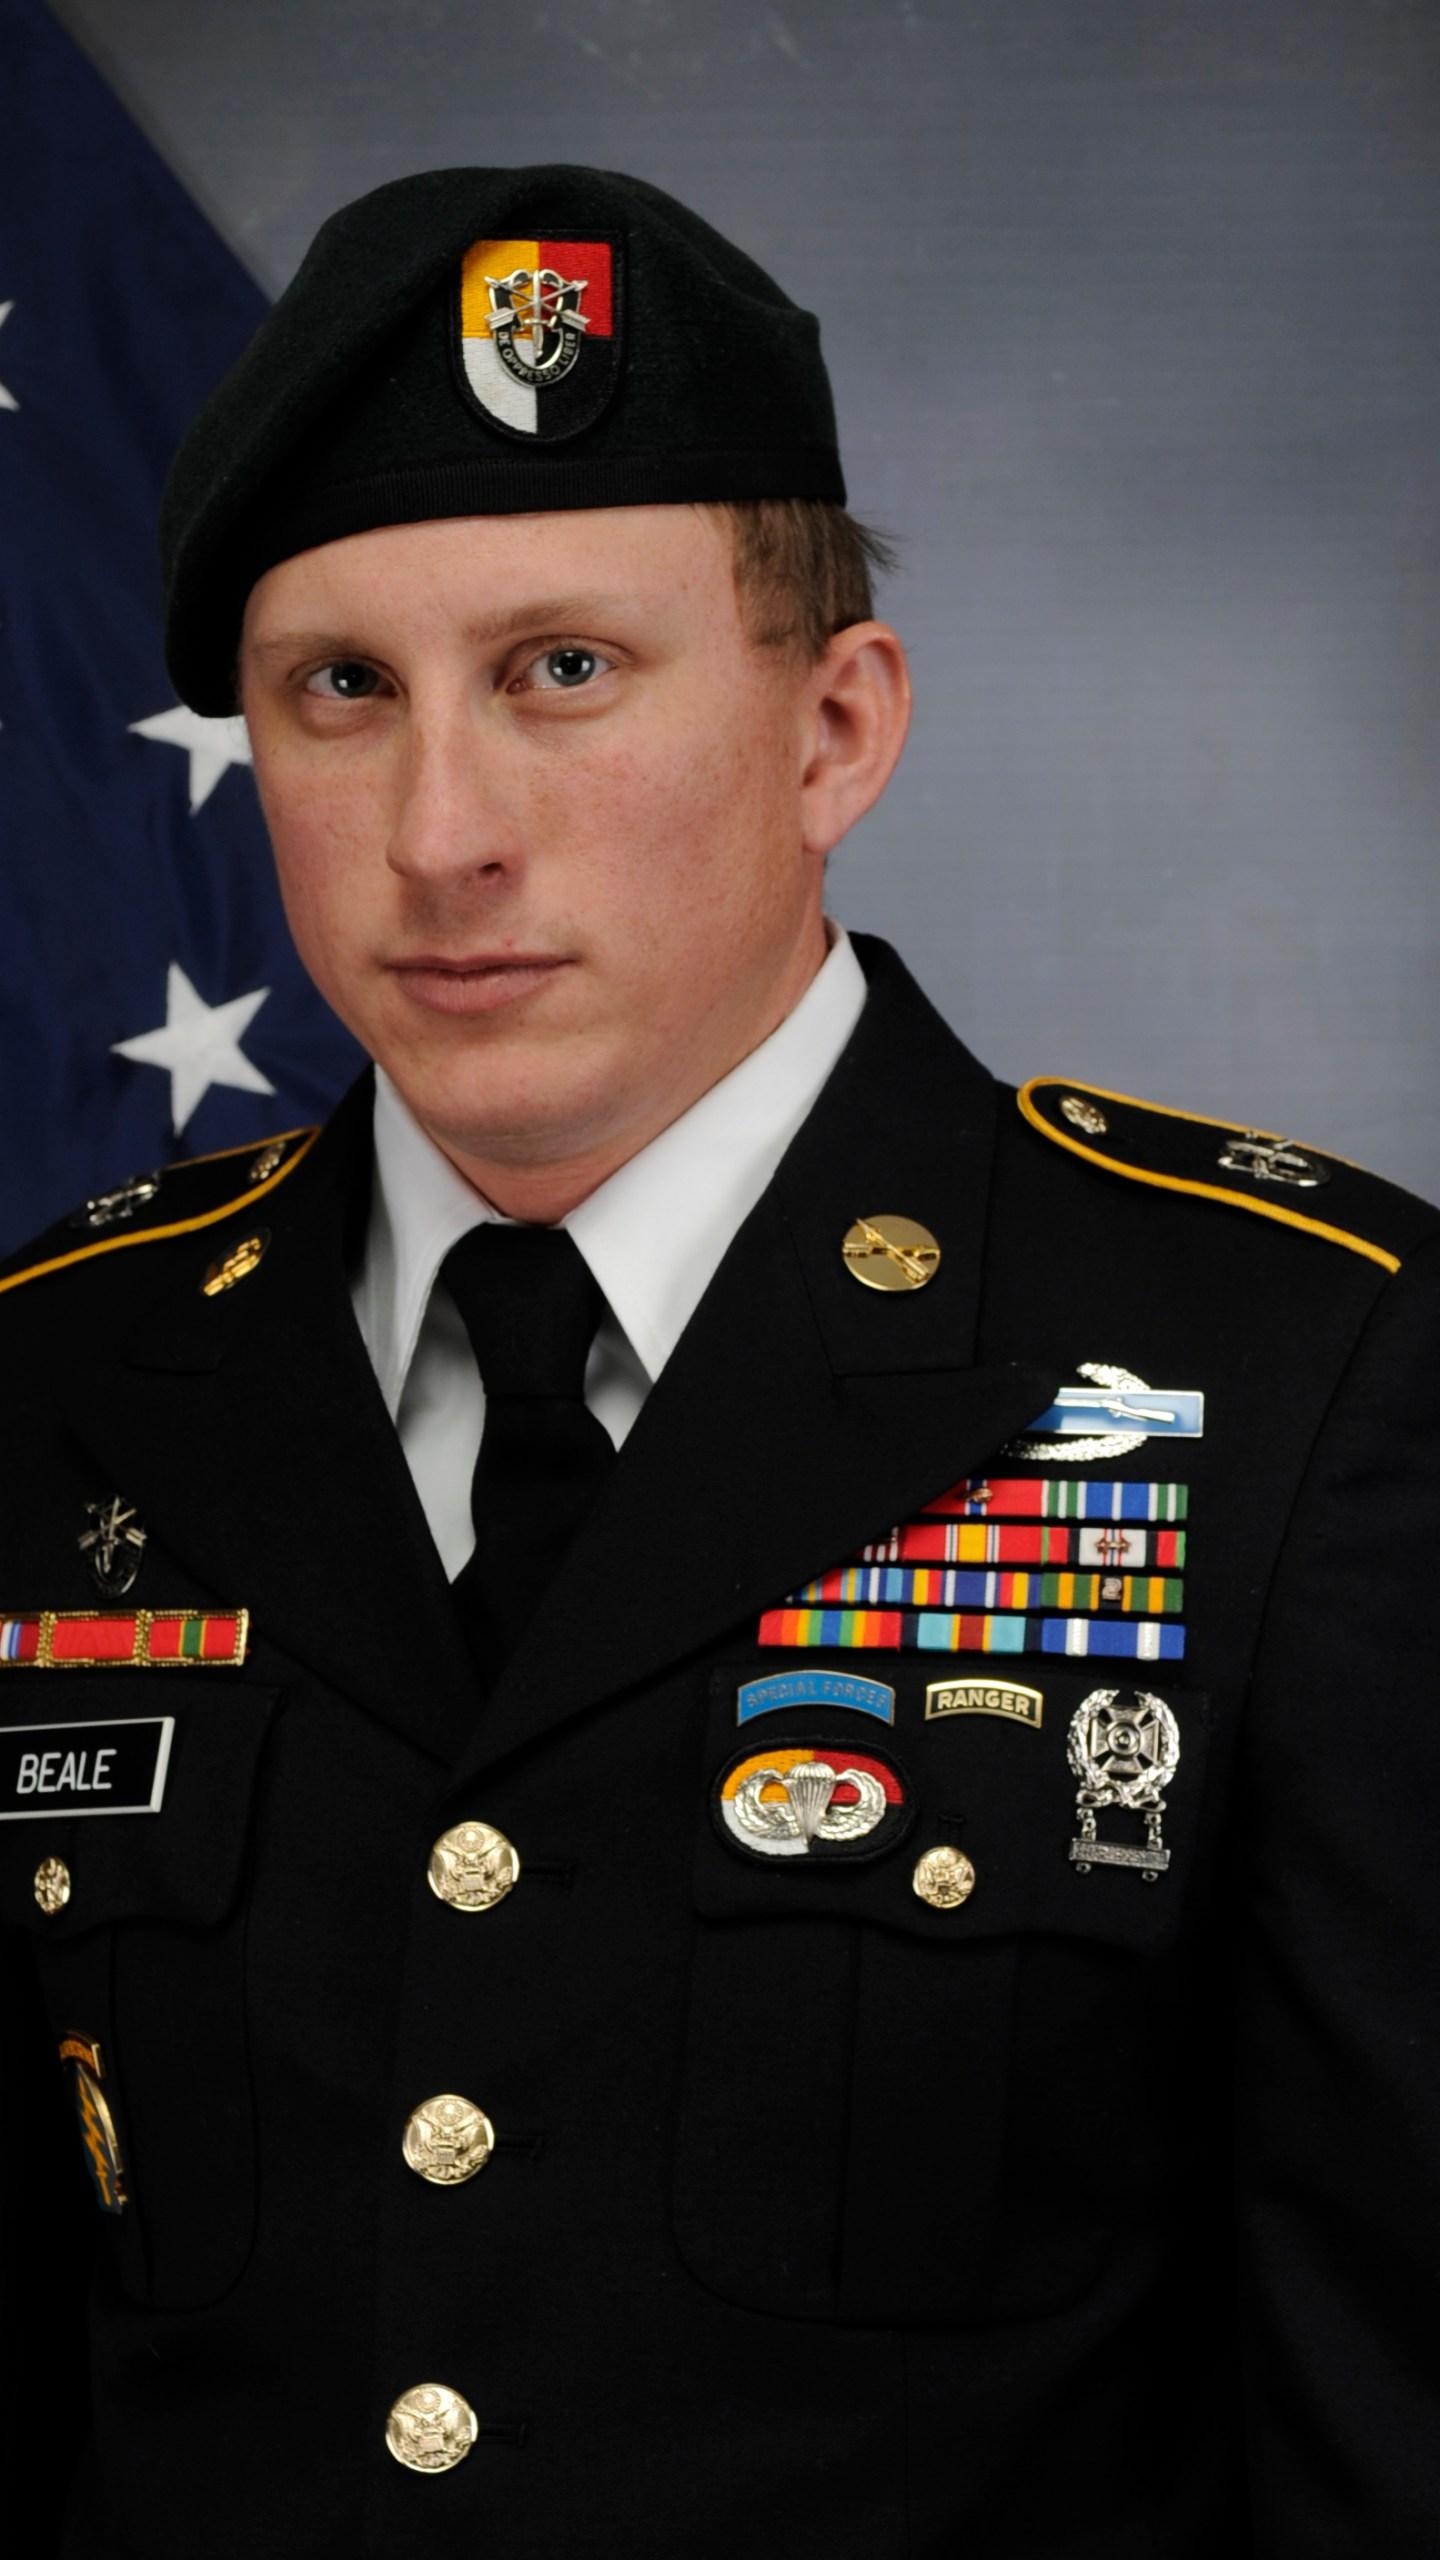 Joshua Zach Beale Fort Bragg U.S. Army Photo_1548276851636.jpg.jpg